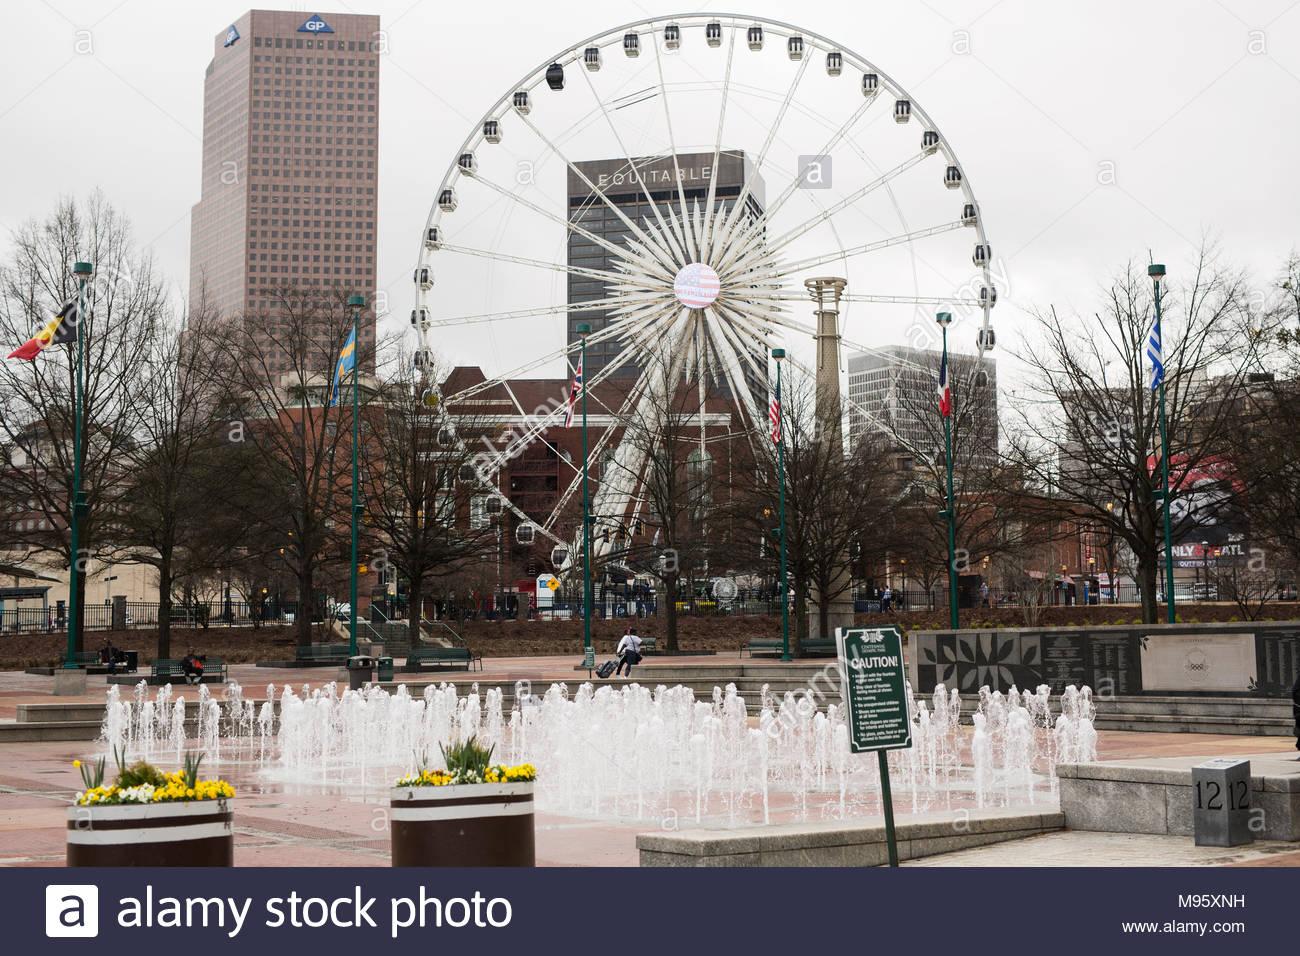 Atlantas Centennial Olympic Park fountain with its ferris wheel 1300x956